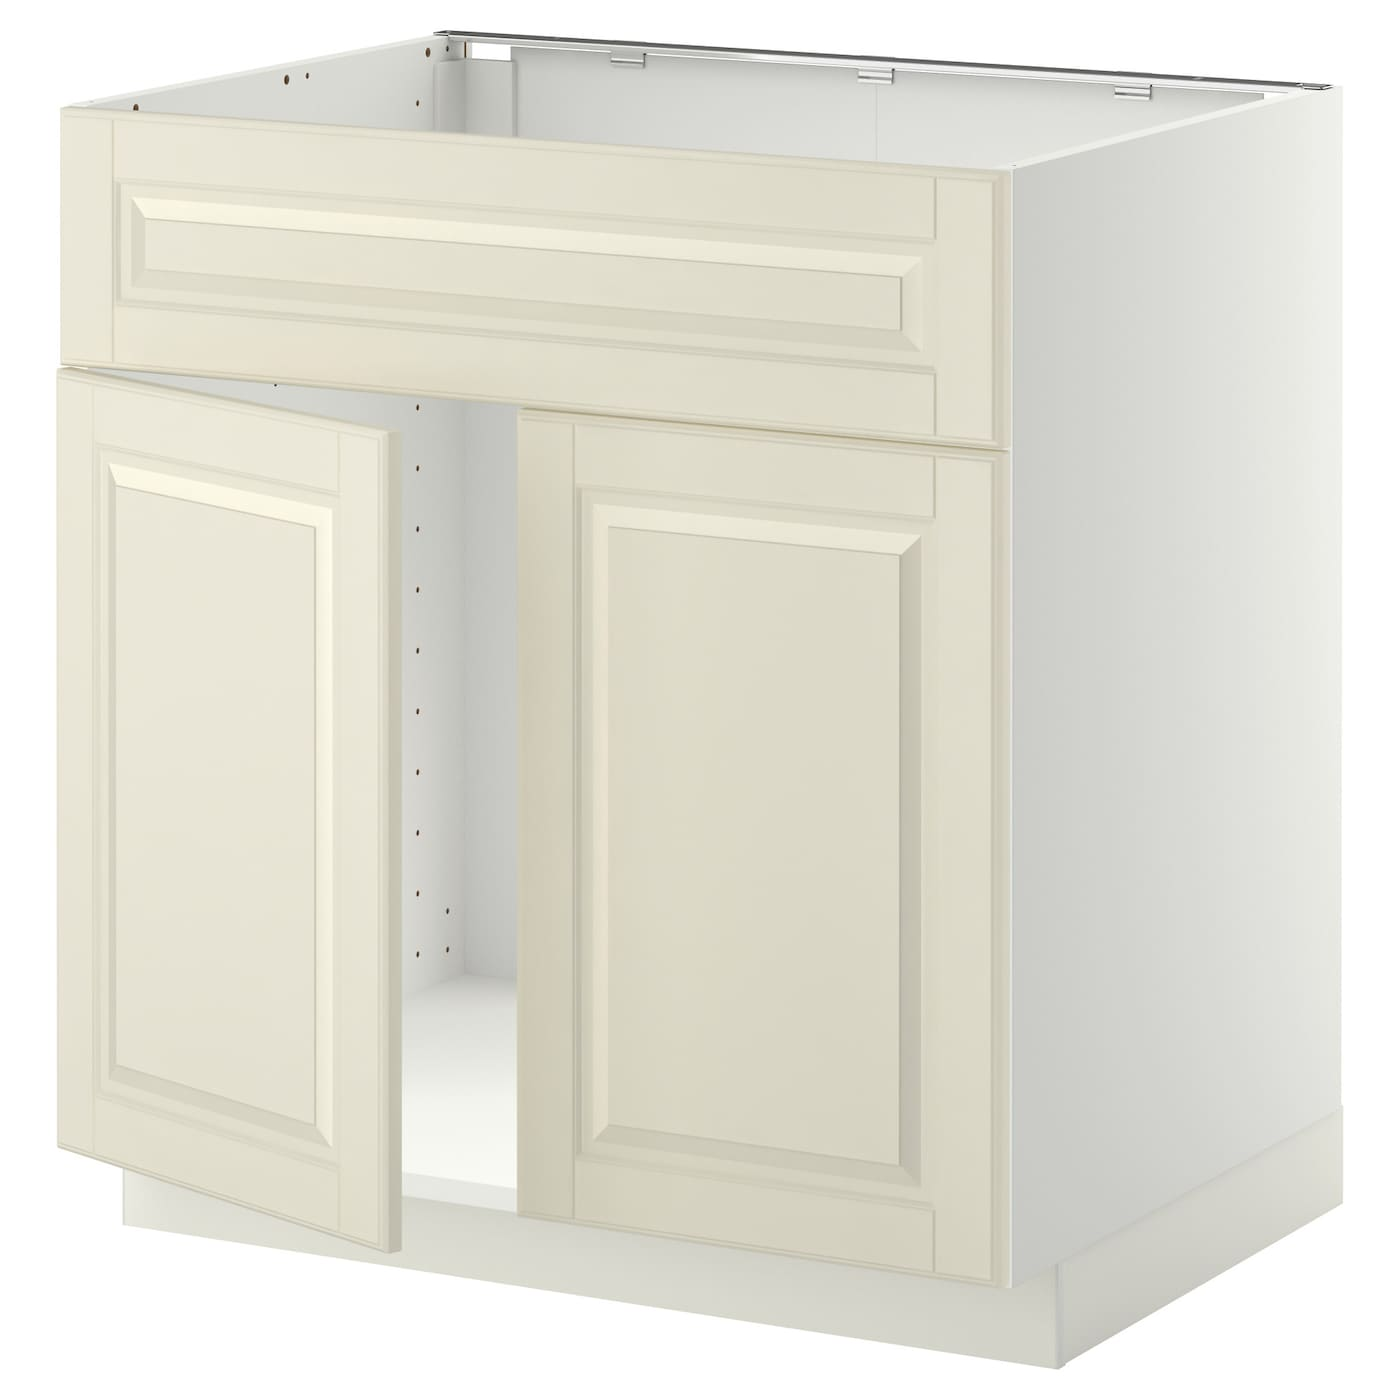 Metod Base Cabinet F Sink W 2 Doors Front White Bodbyn Off White 80x60 Cm Ikea